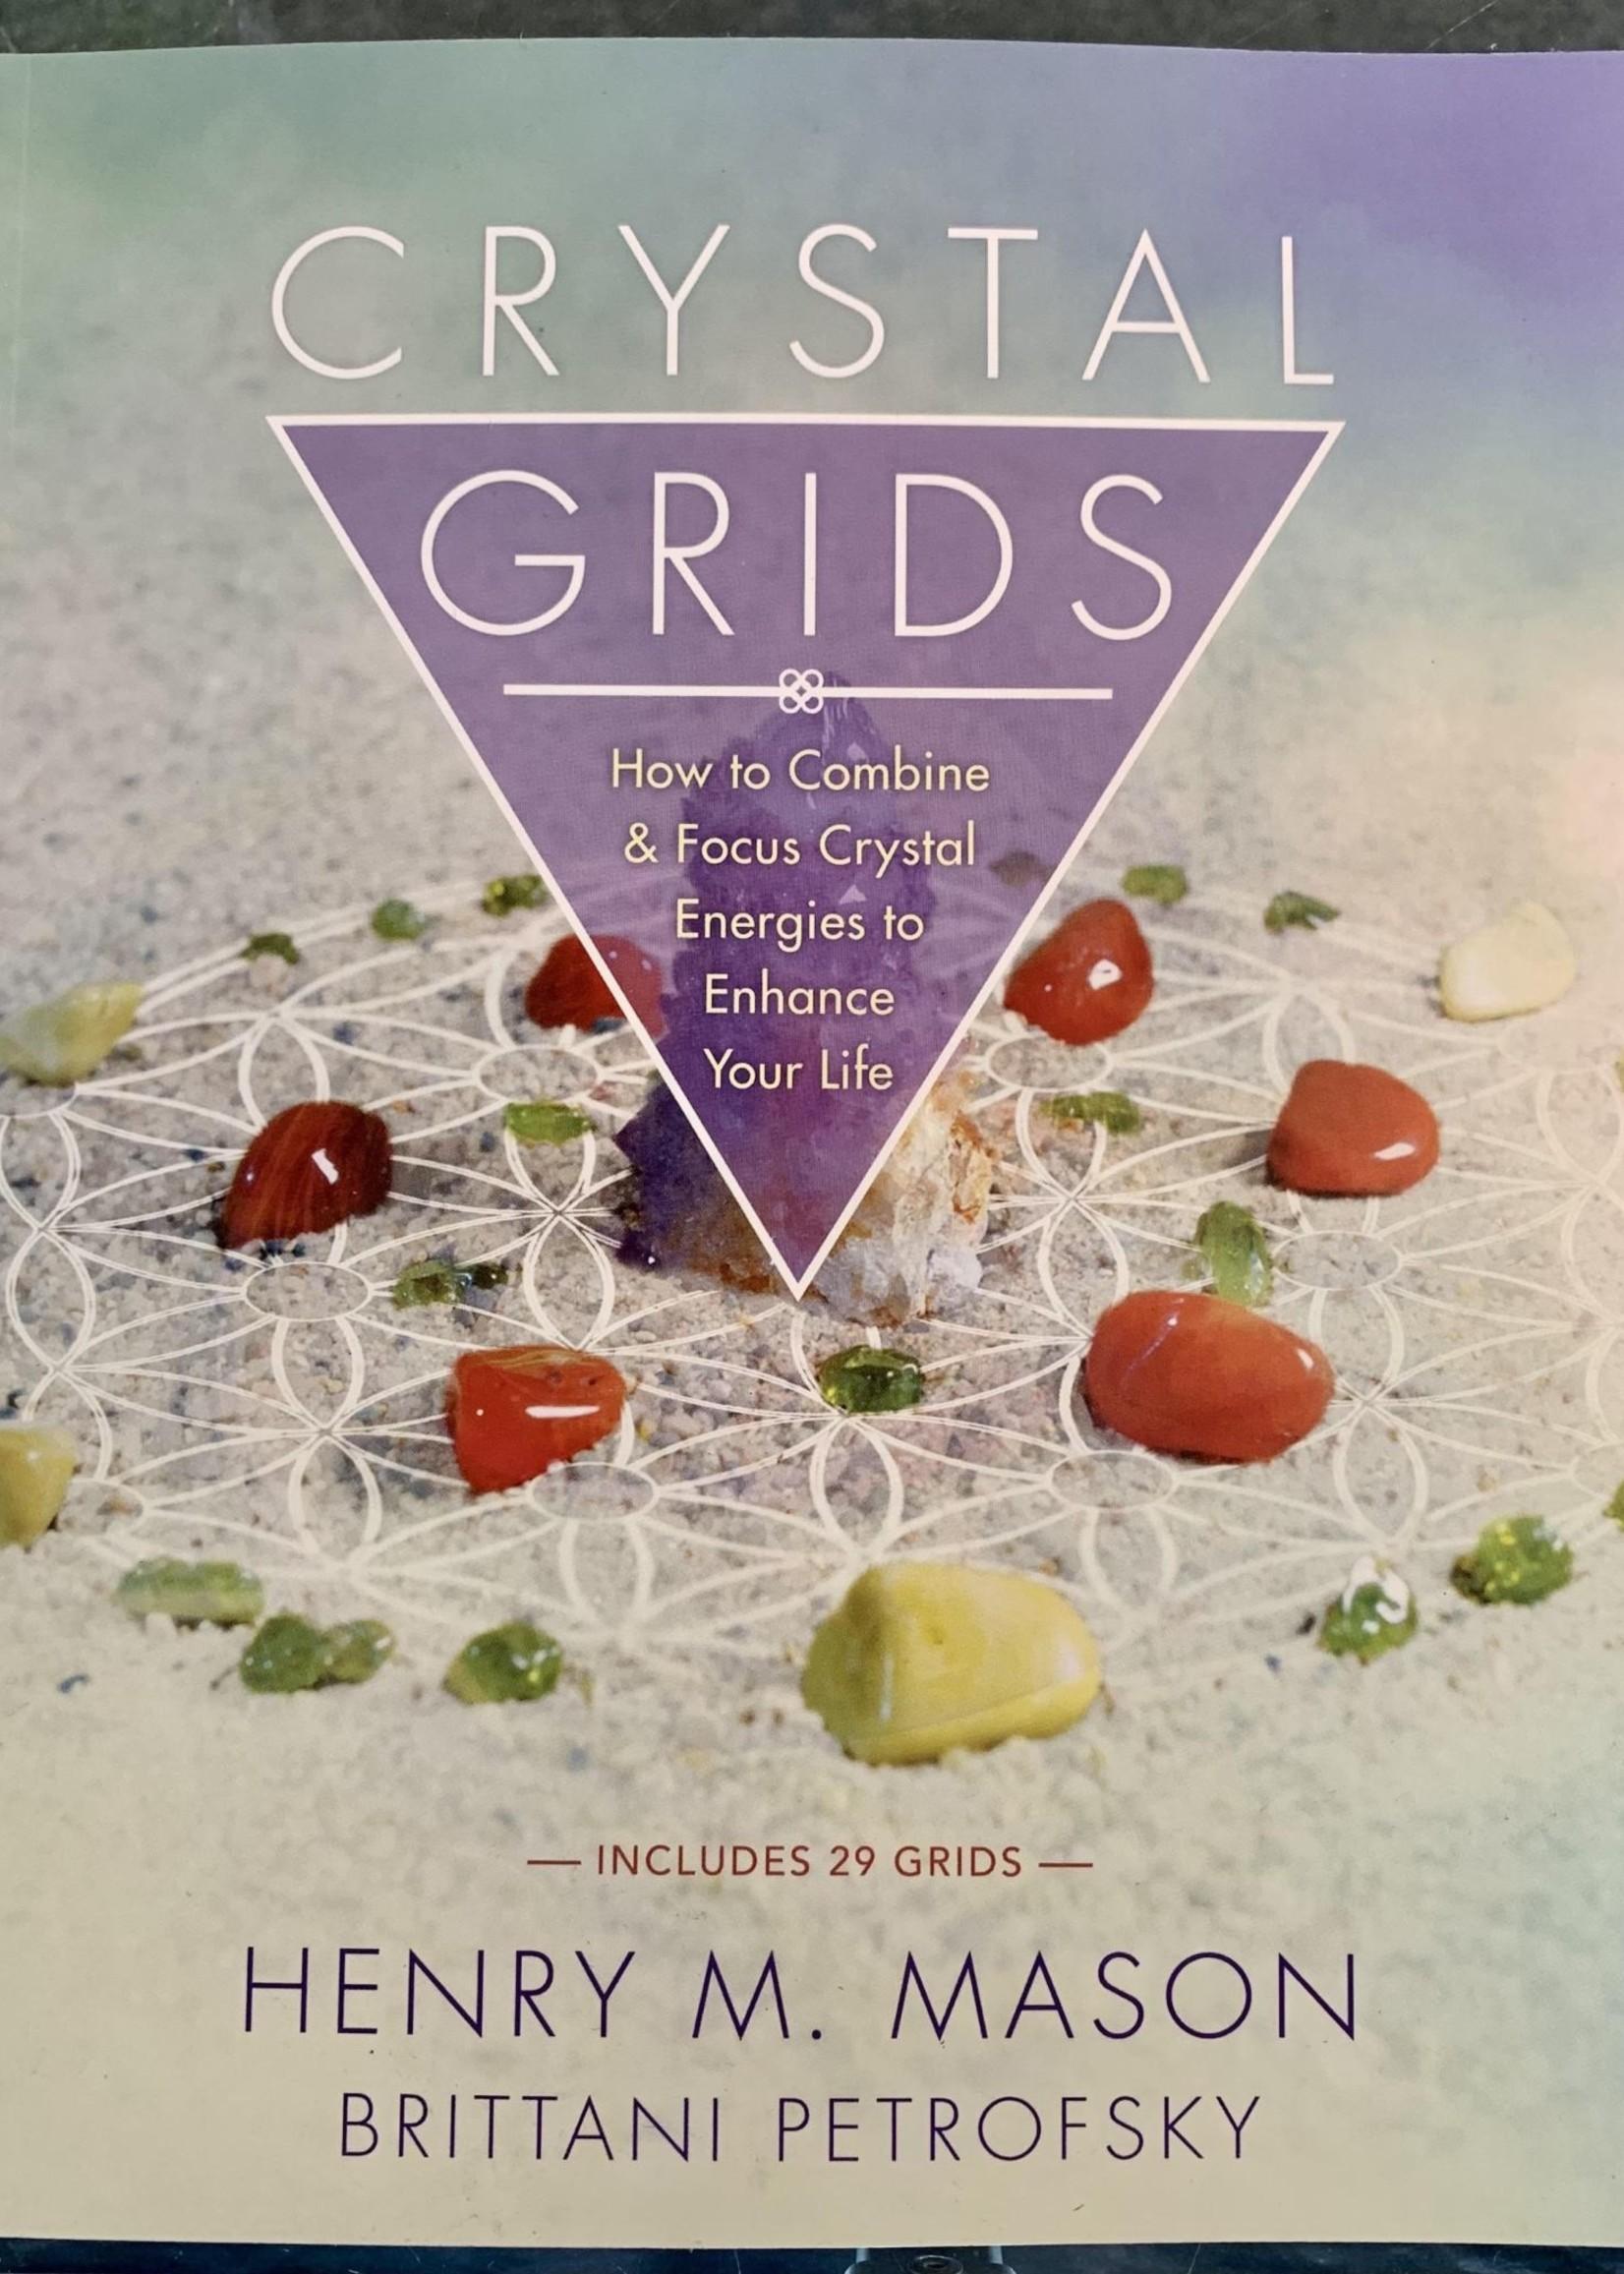 Crystal Grids - BY HENRY M. MASON, BRITTANI PETROFSKY